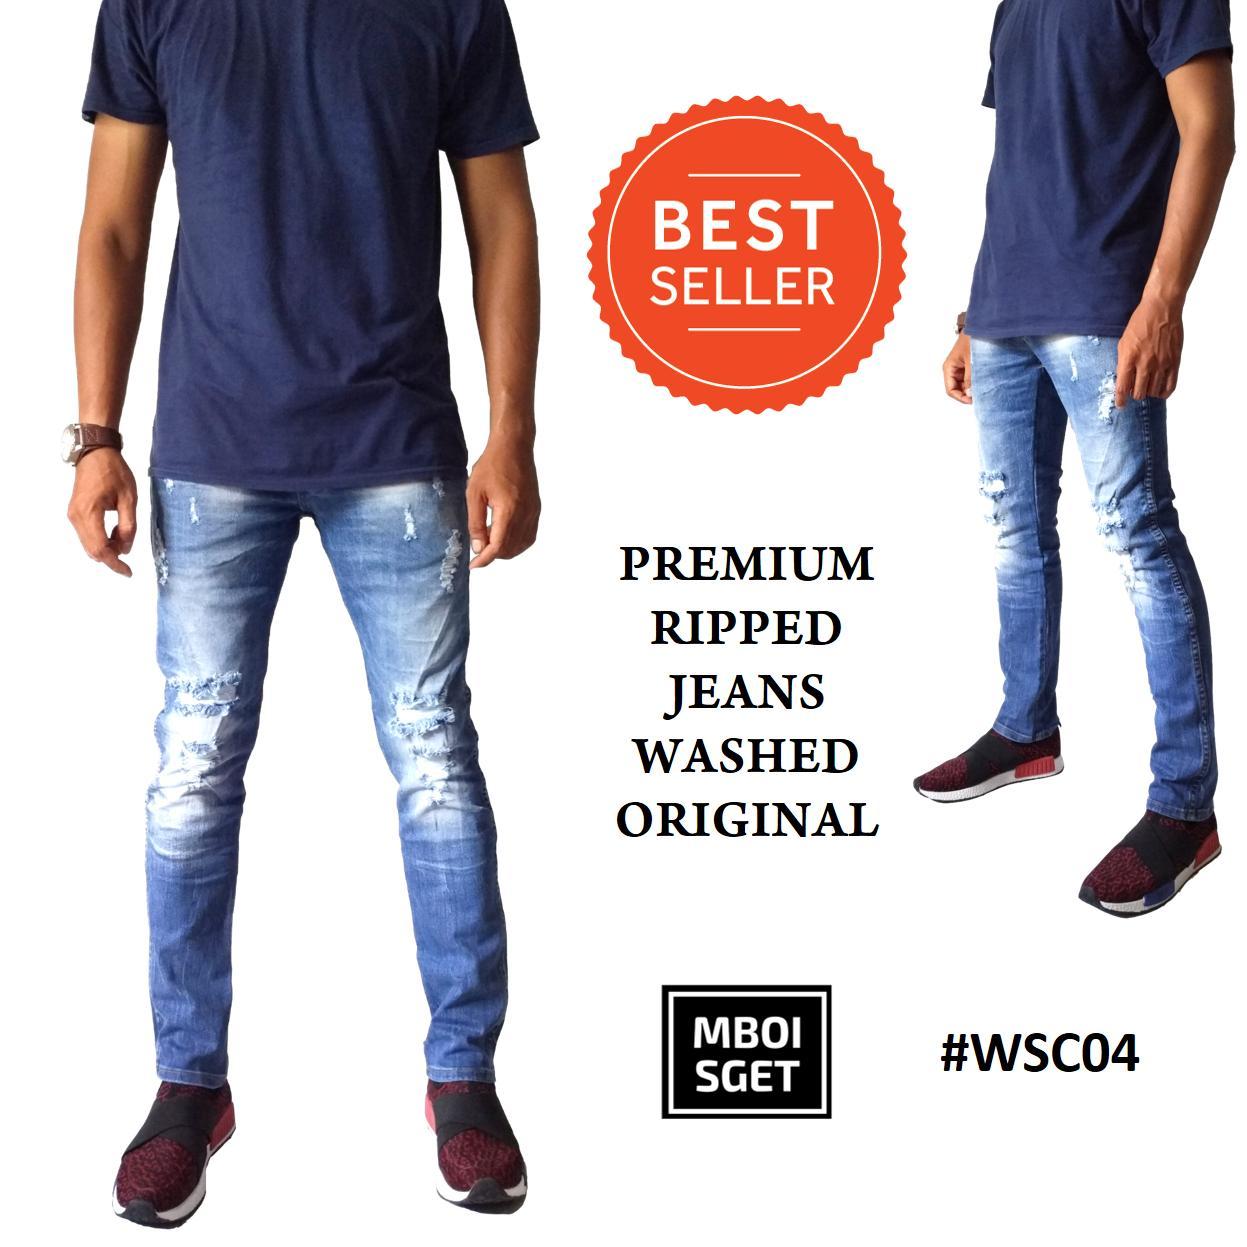 Mboisget WSC04 Wiscer Jeans Original Brand Celana Panjang Jeans Pria Cowok Premium Ripped Washed Sobek Slimfit Skinny Street Pensil